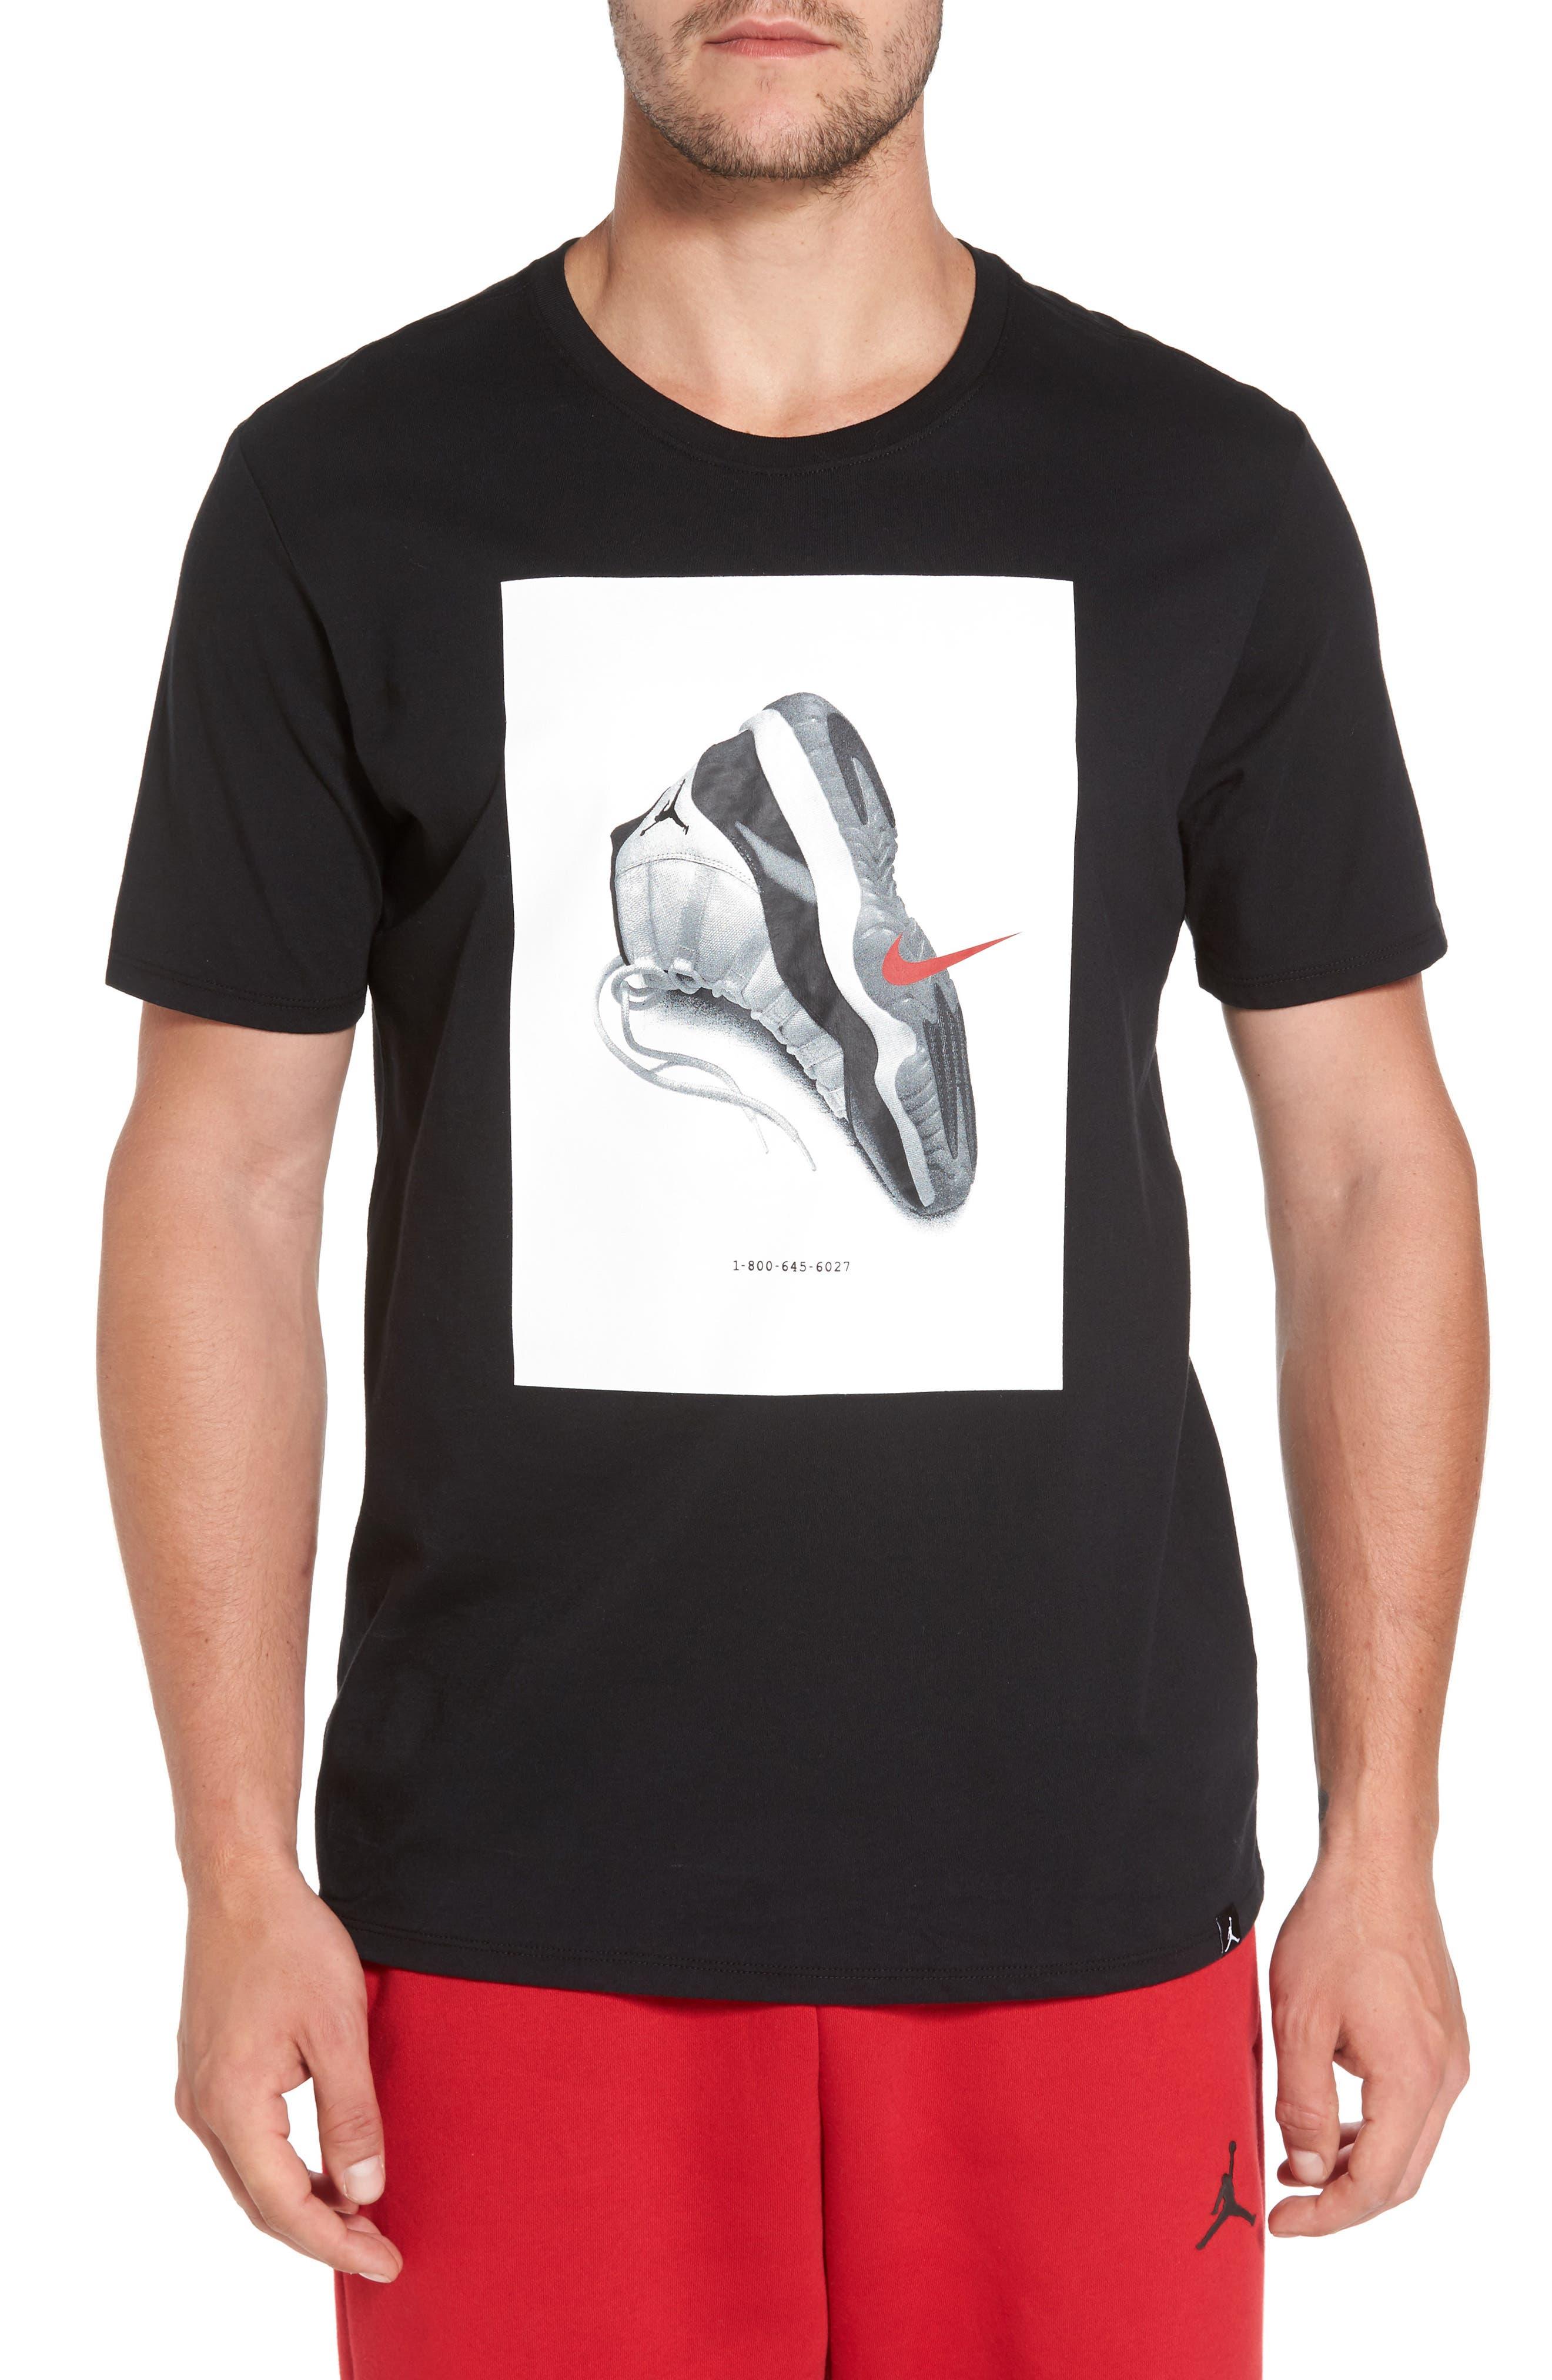 Nike Jordan Sportswear AJ11 CNXN Graphic T-Shirt